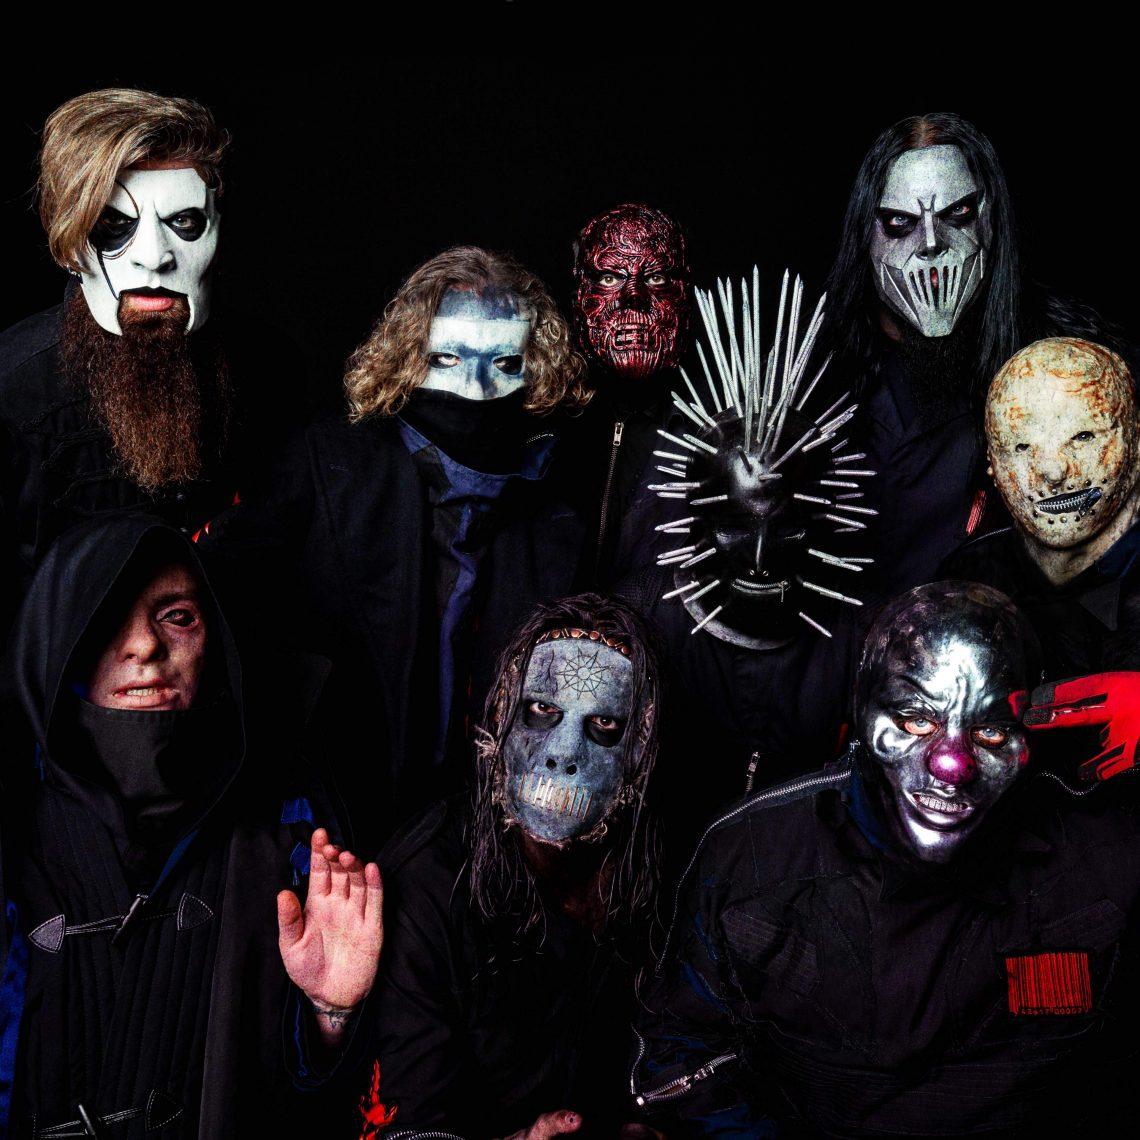 SLIPKNOT announce UK tour dates